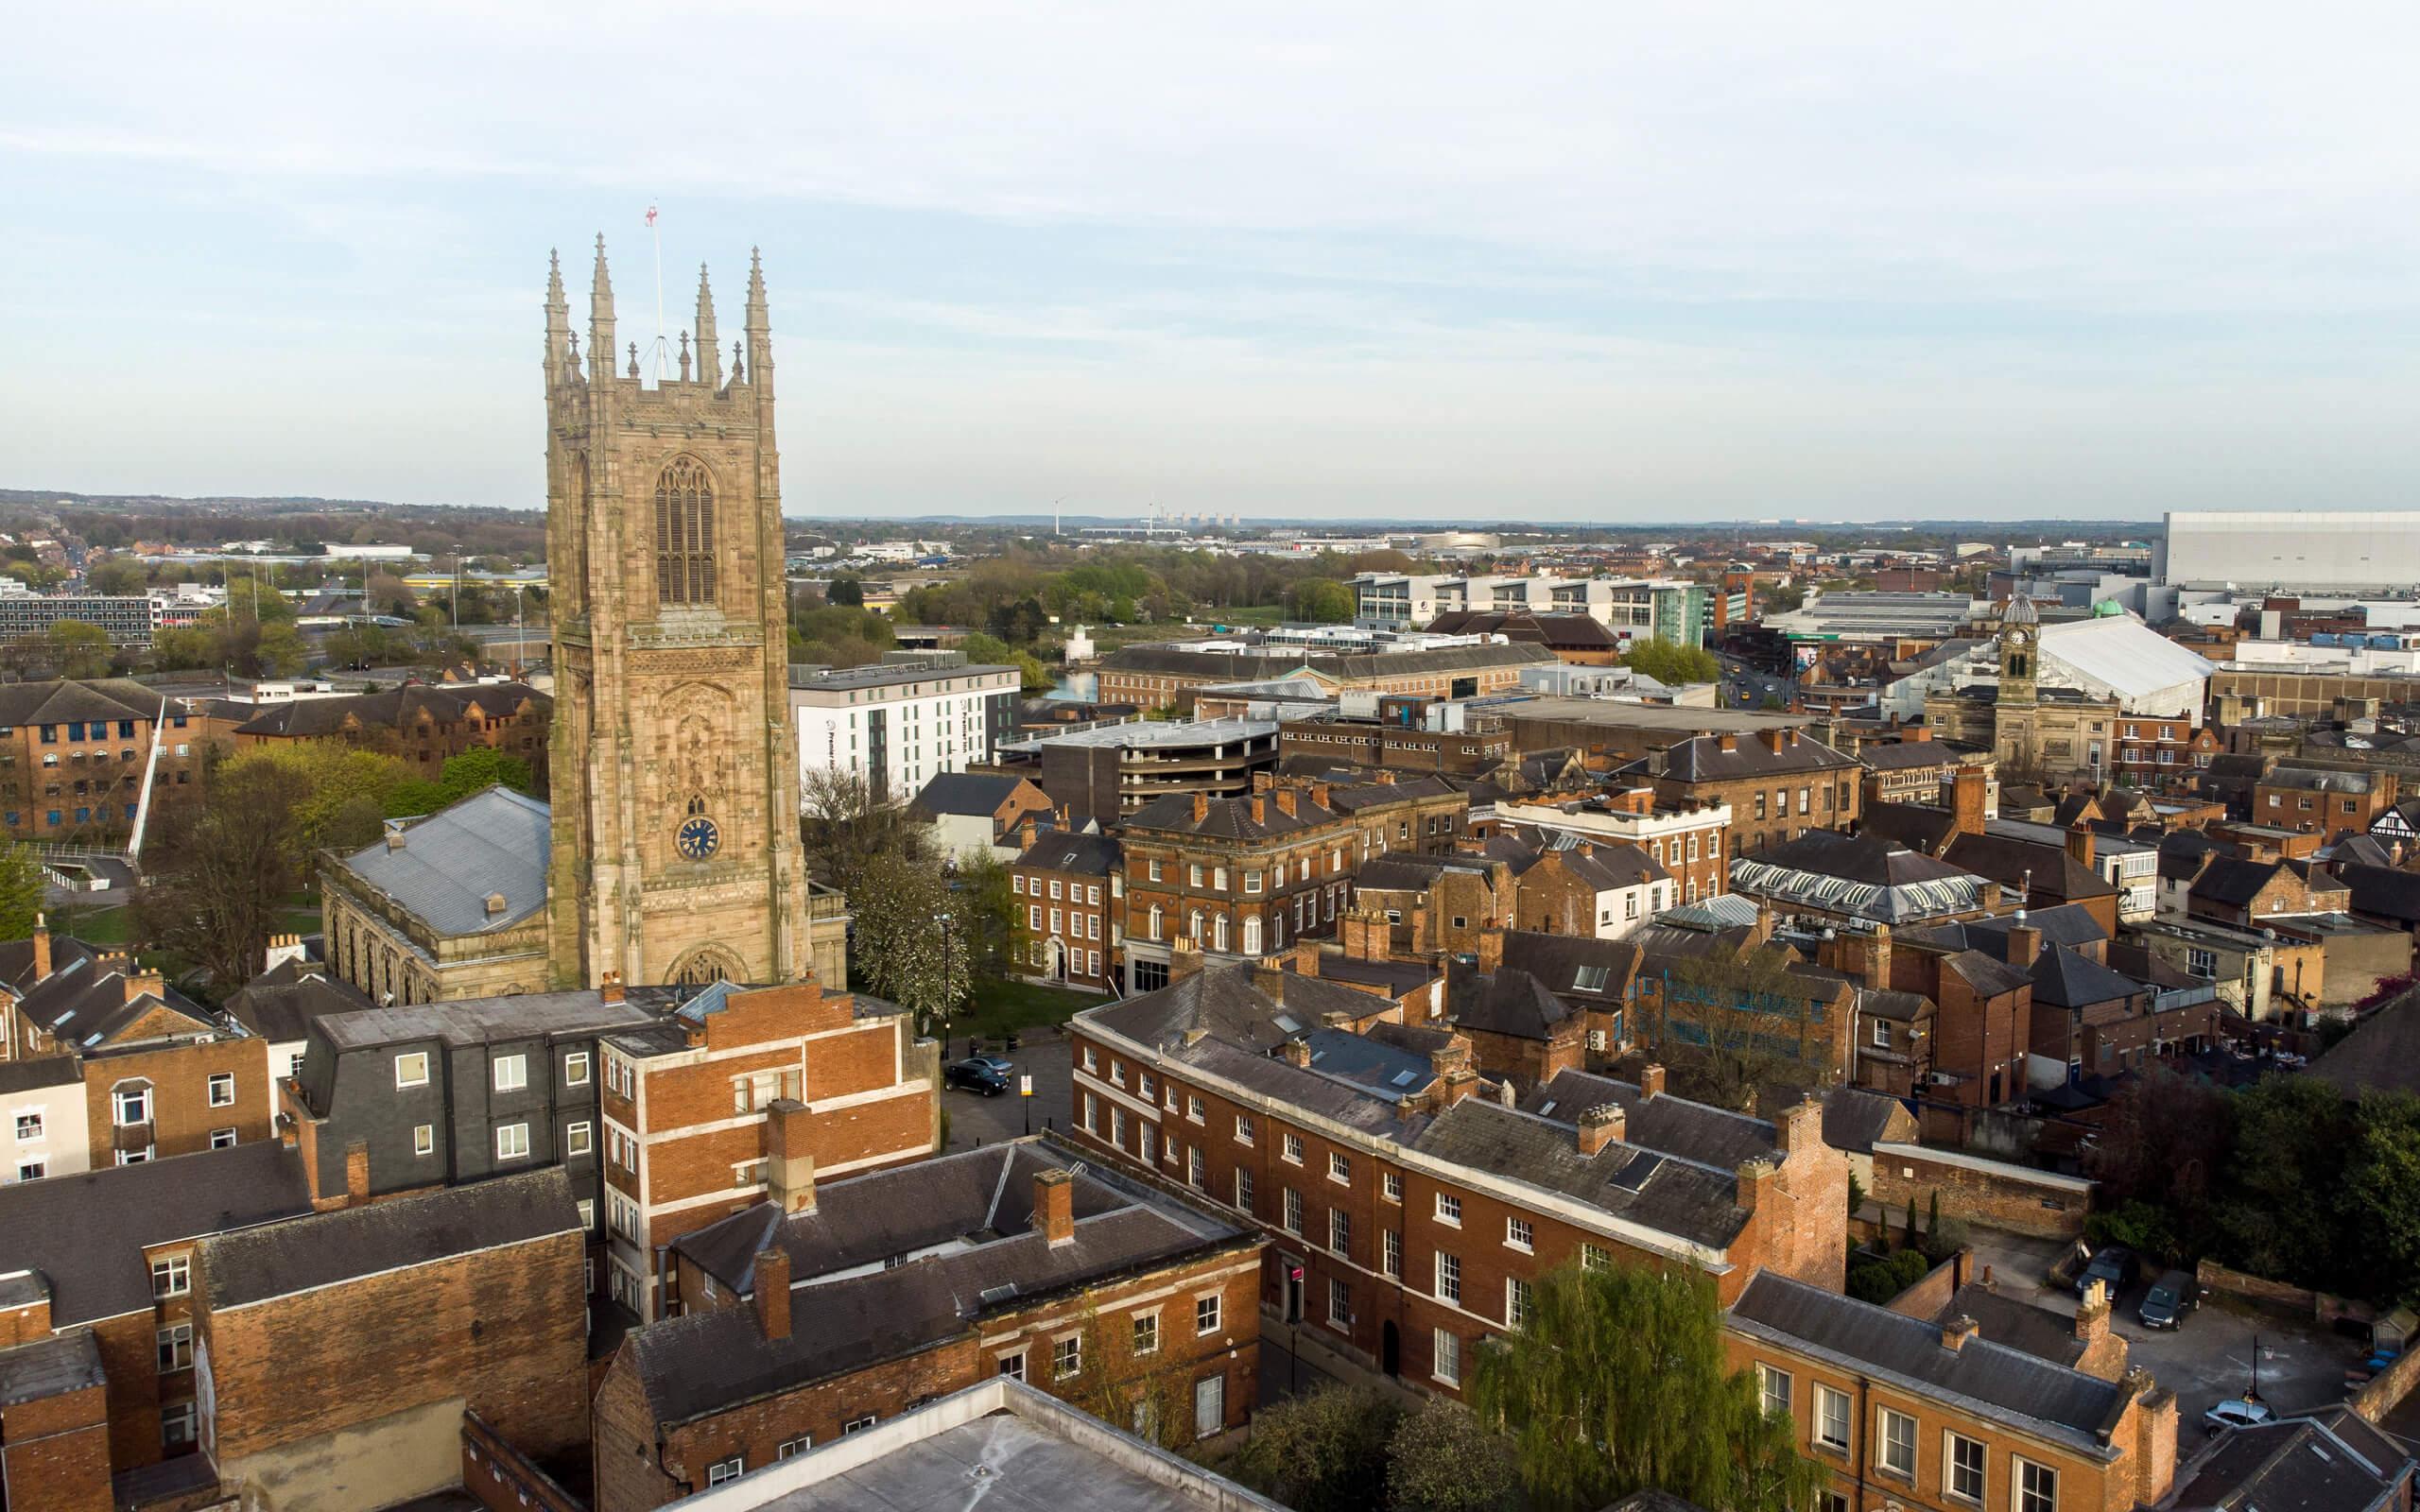 Skyline image of Derby city centre